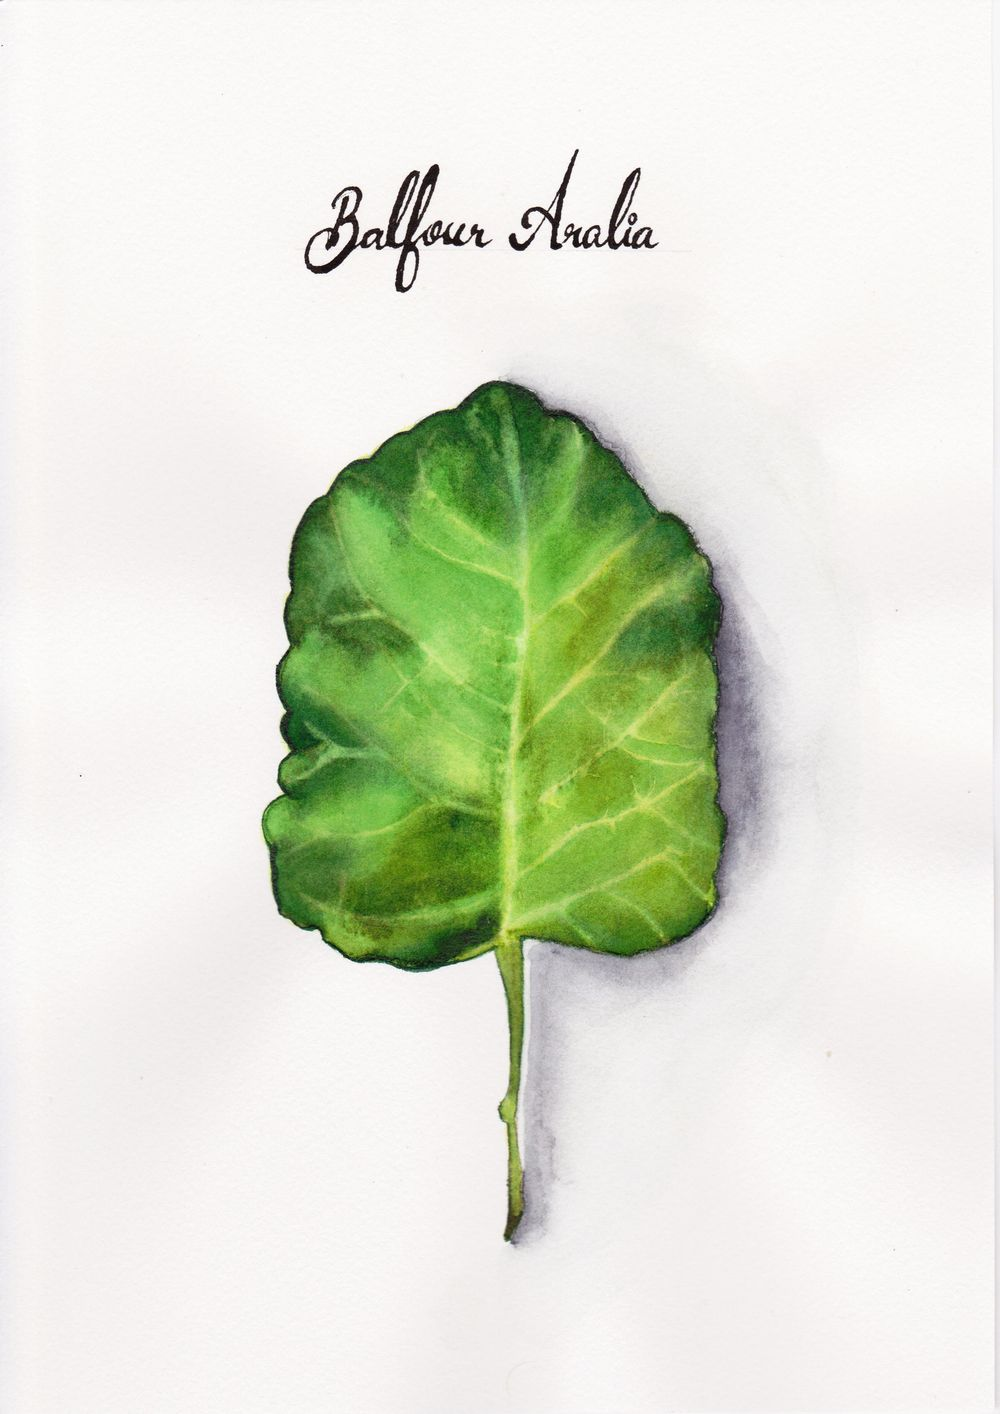 Balfour Aralia - image 1 - student project